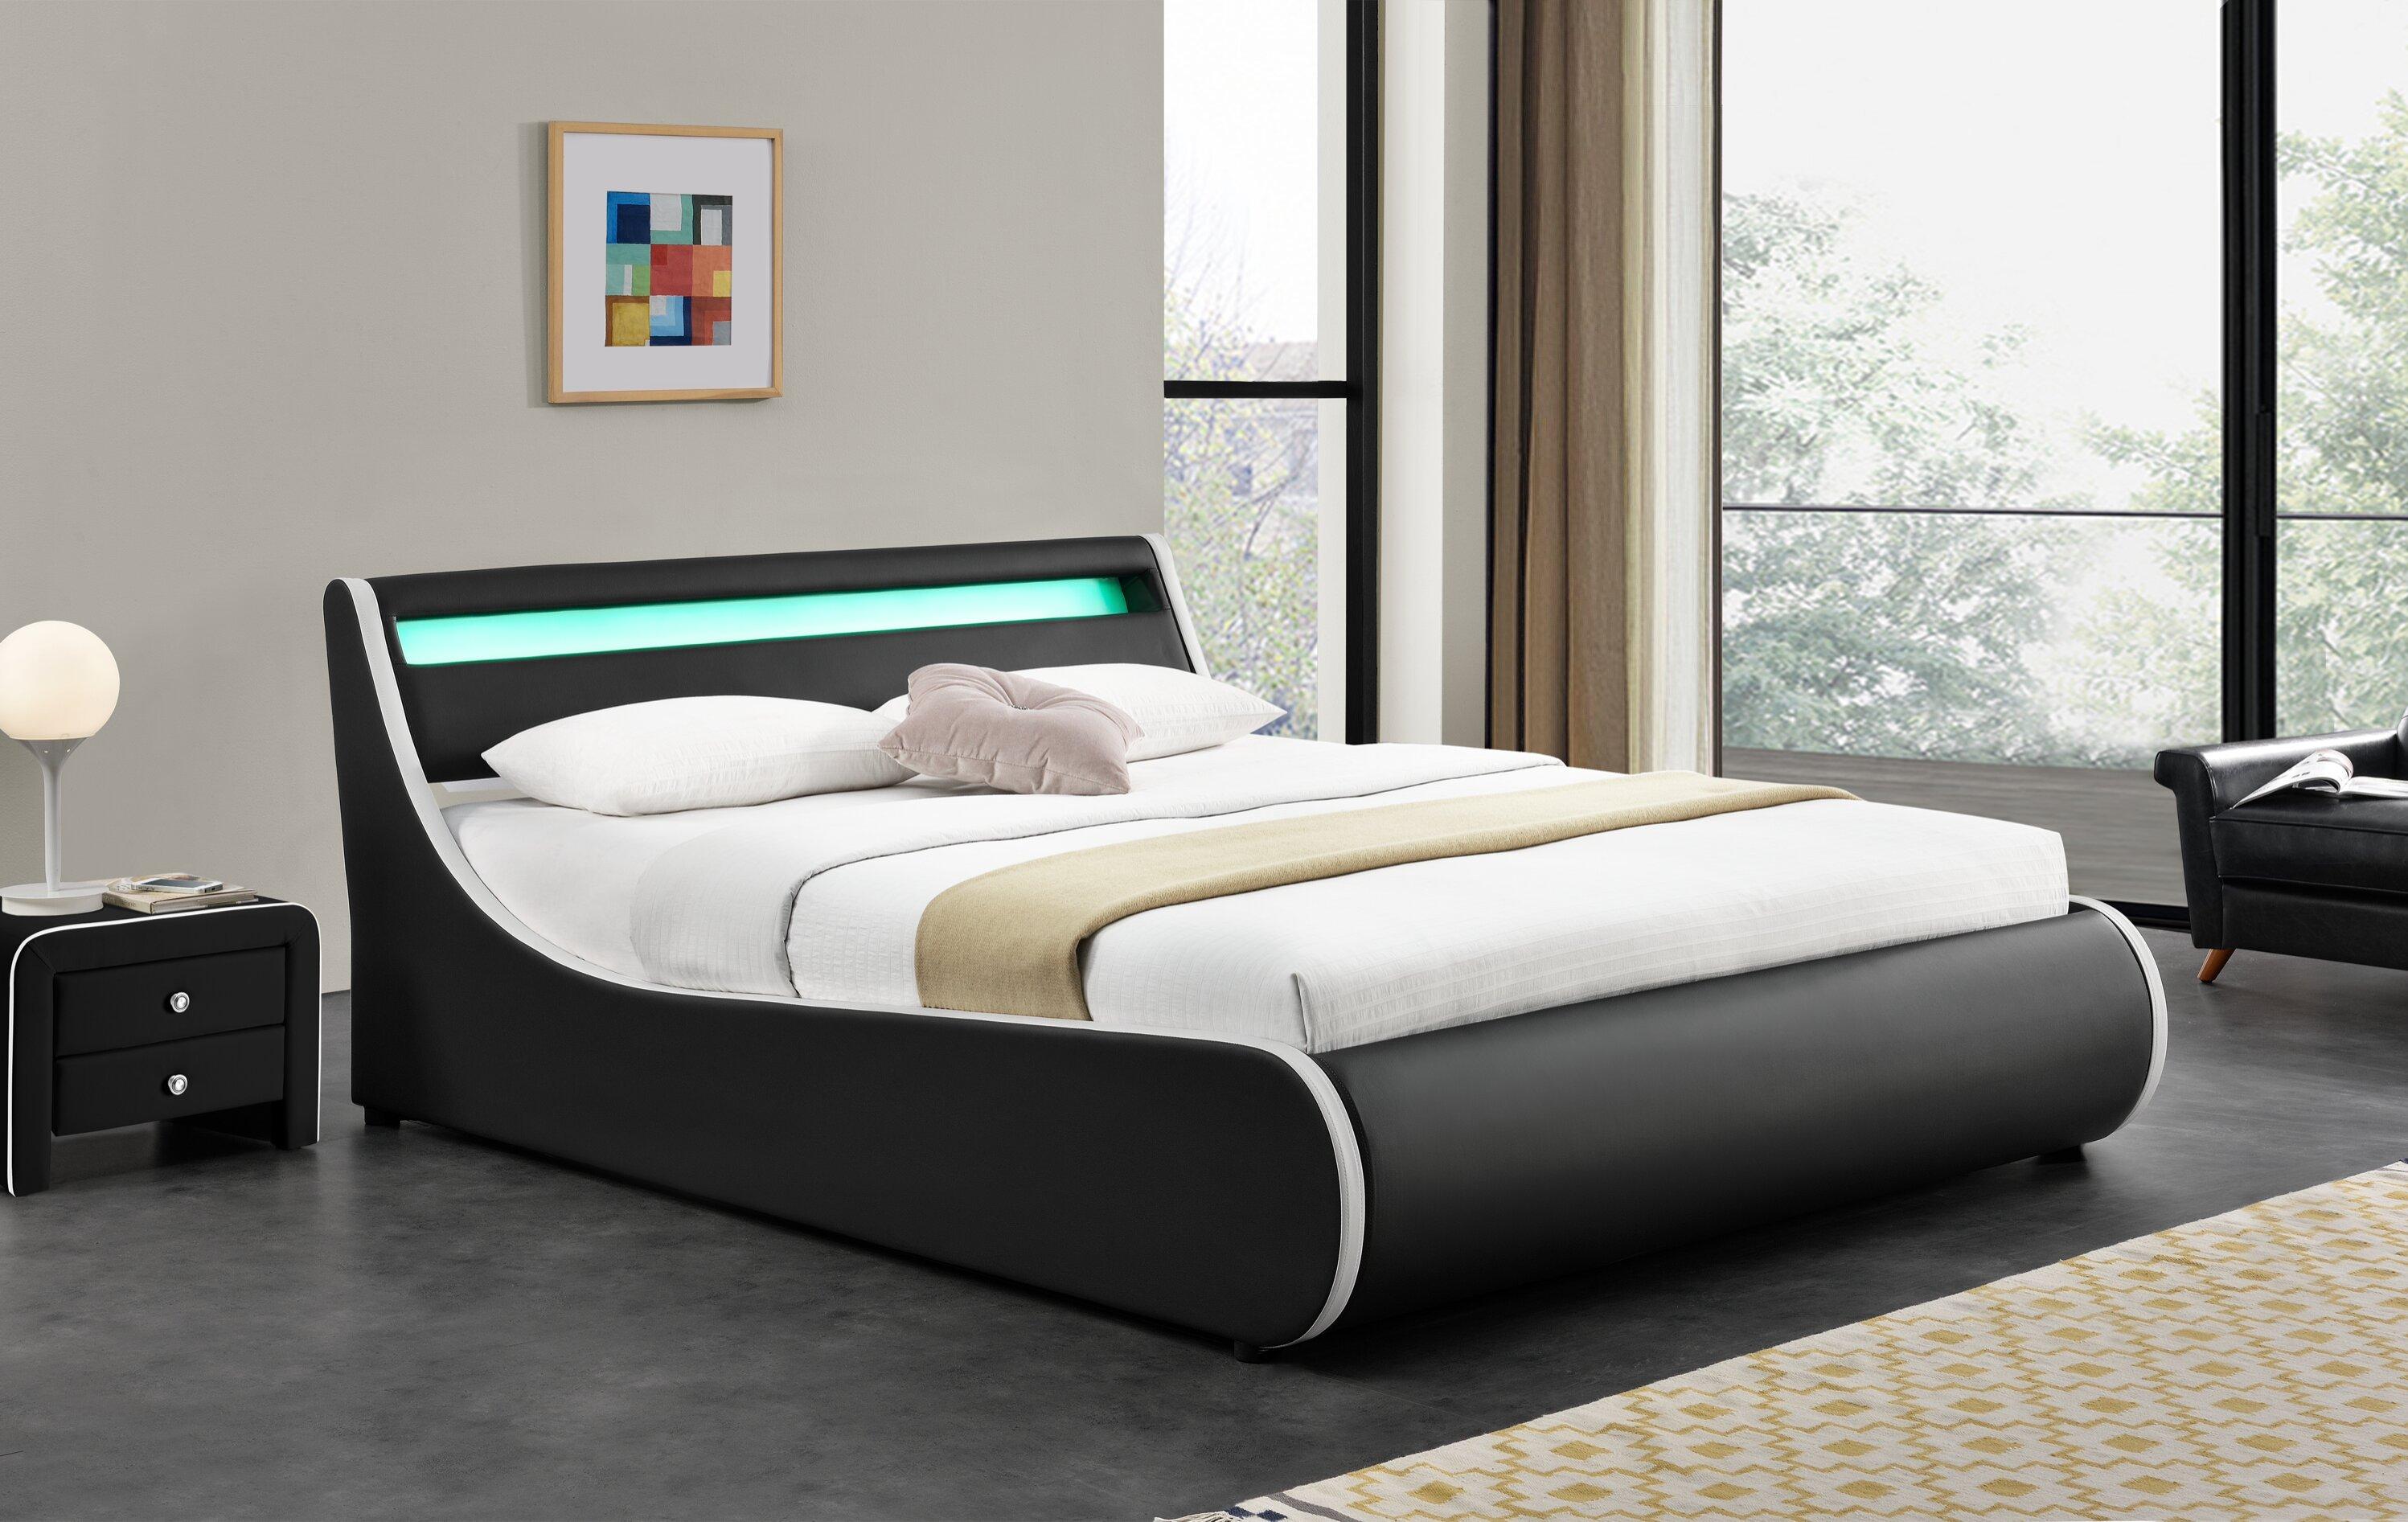 Perth Upholstered Low Profile Storage Platform Bed